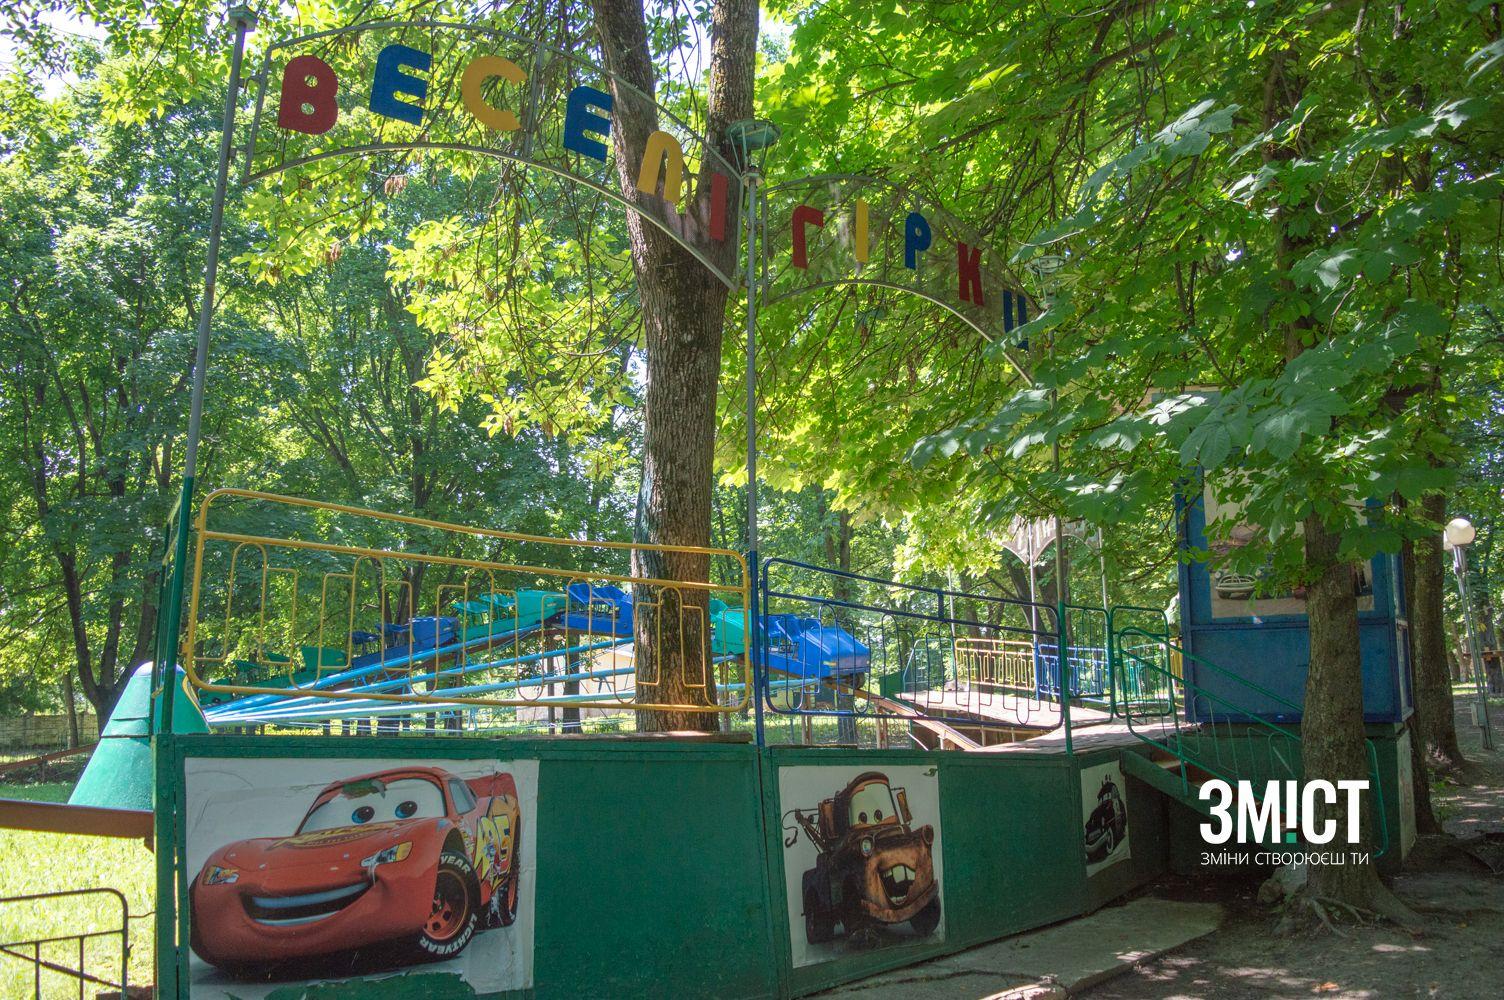 Атракціон у парку «Перемога»